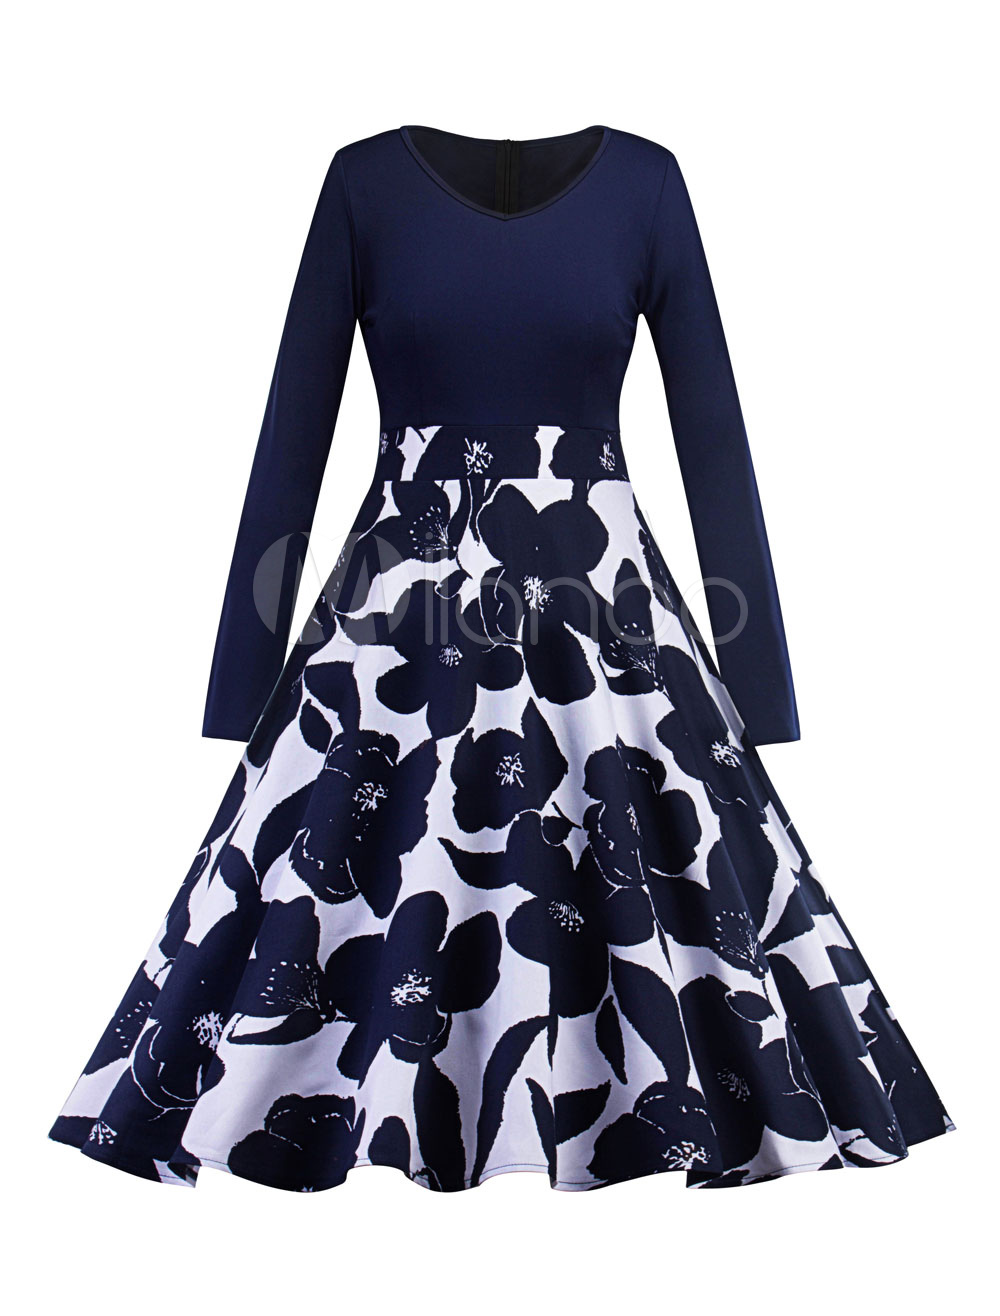 Women Vintage Dress 1950s Floral Swing Dresses Long Sleeve Navy Spring Dress (Women\\'s Clothing Vintage Dresses) photo